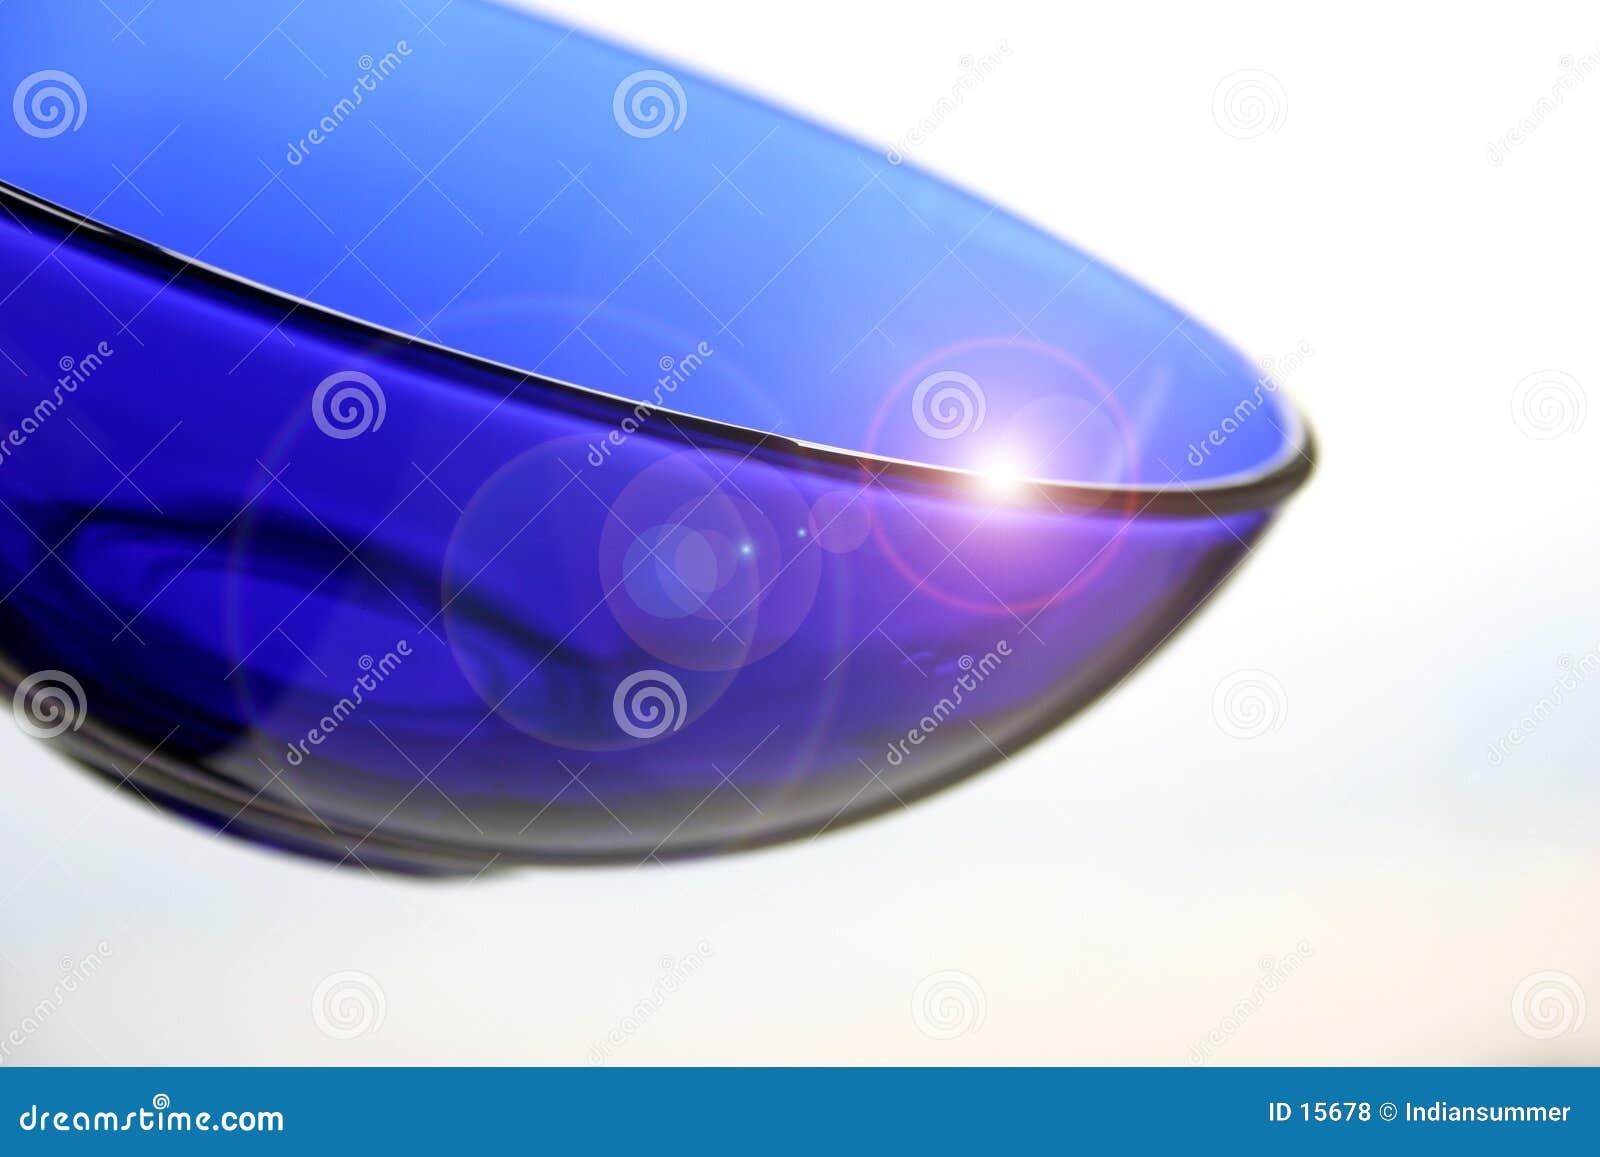 Blaue Glasplatte